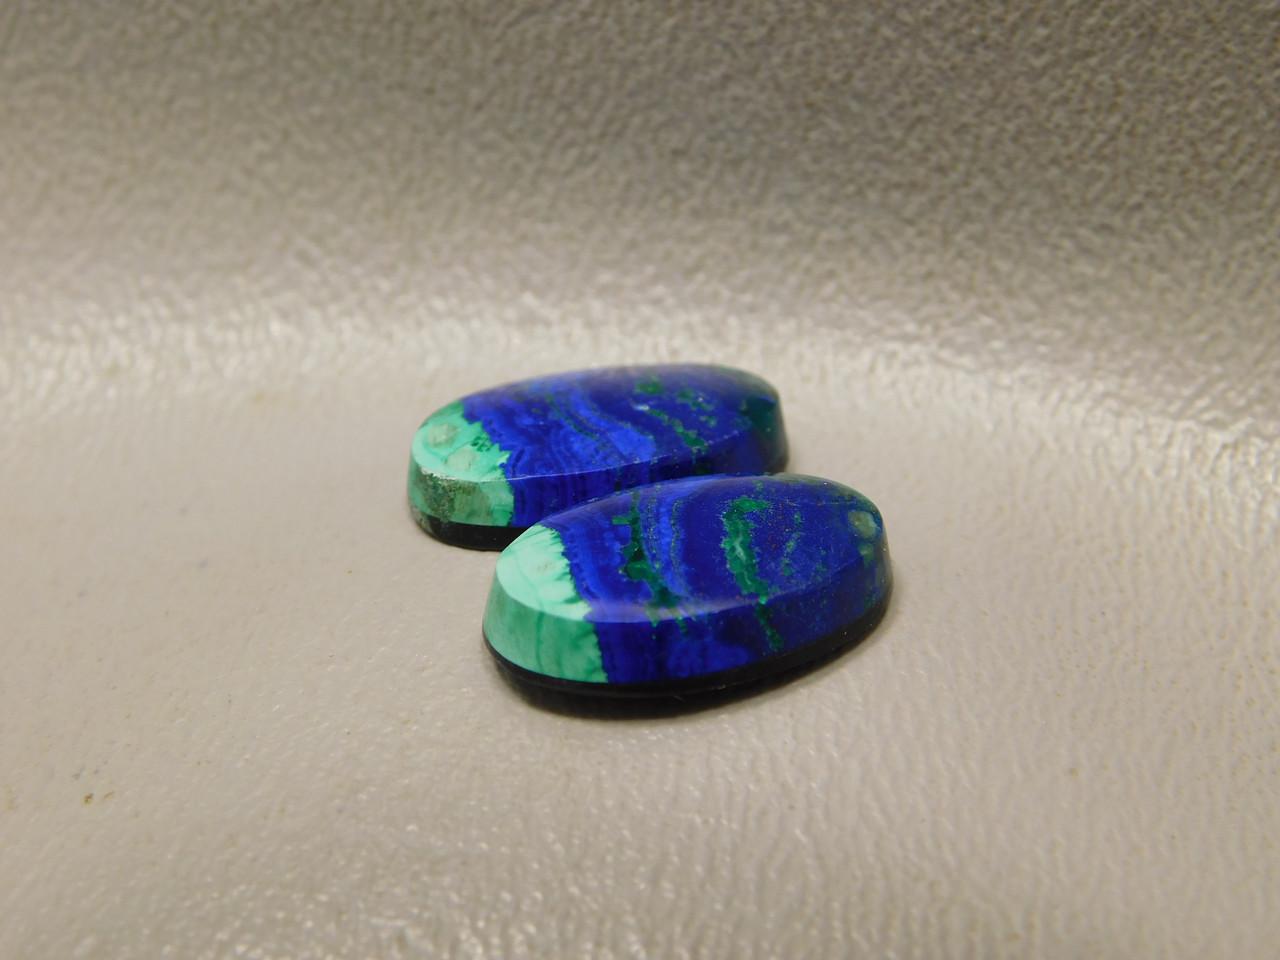 Azurite Malachite Blue Green Matched Pairs Cabochons Ovals #25